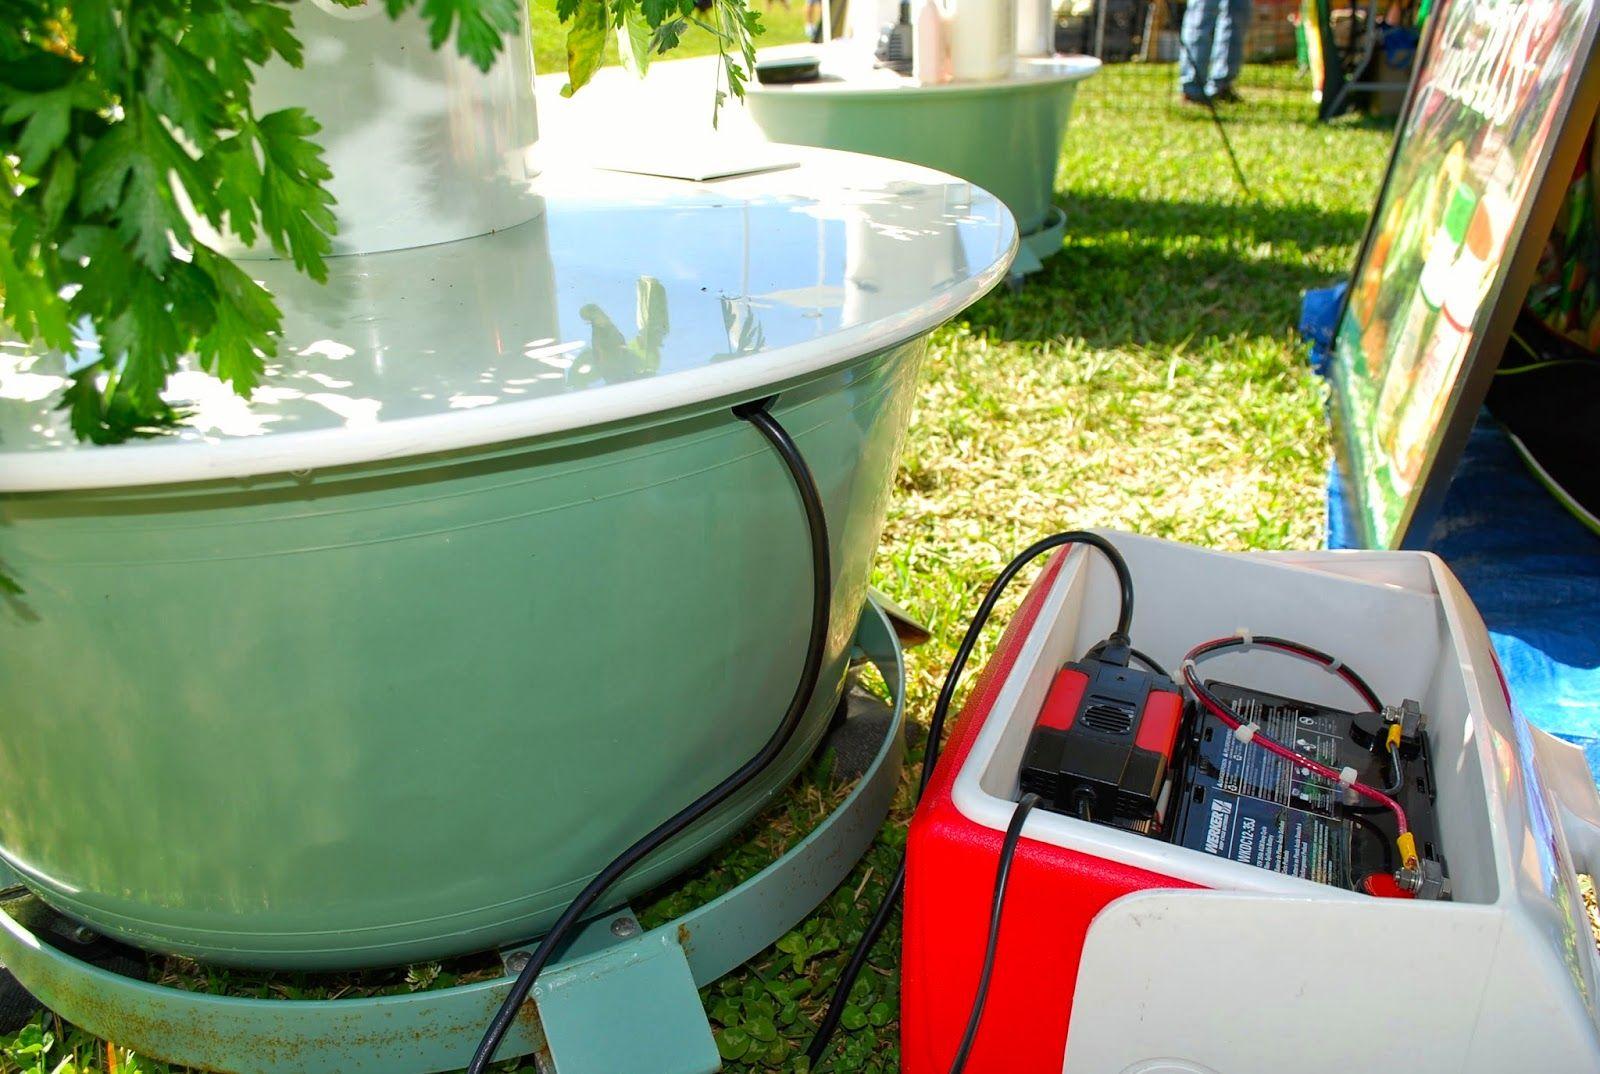 Helen A. Lockey Solar Powered Aeroponic Tower Garden by